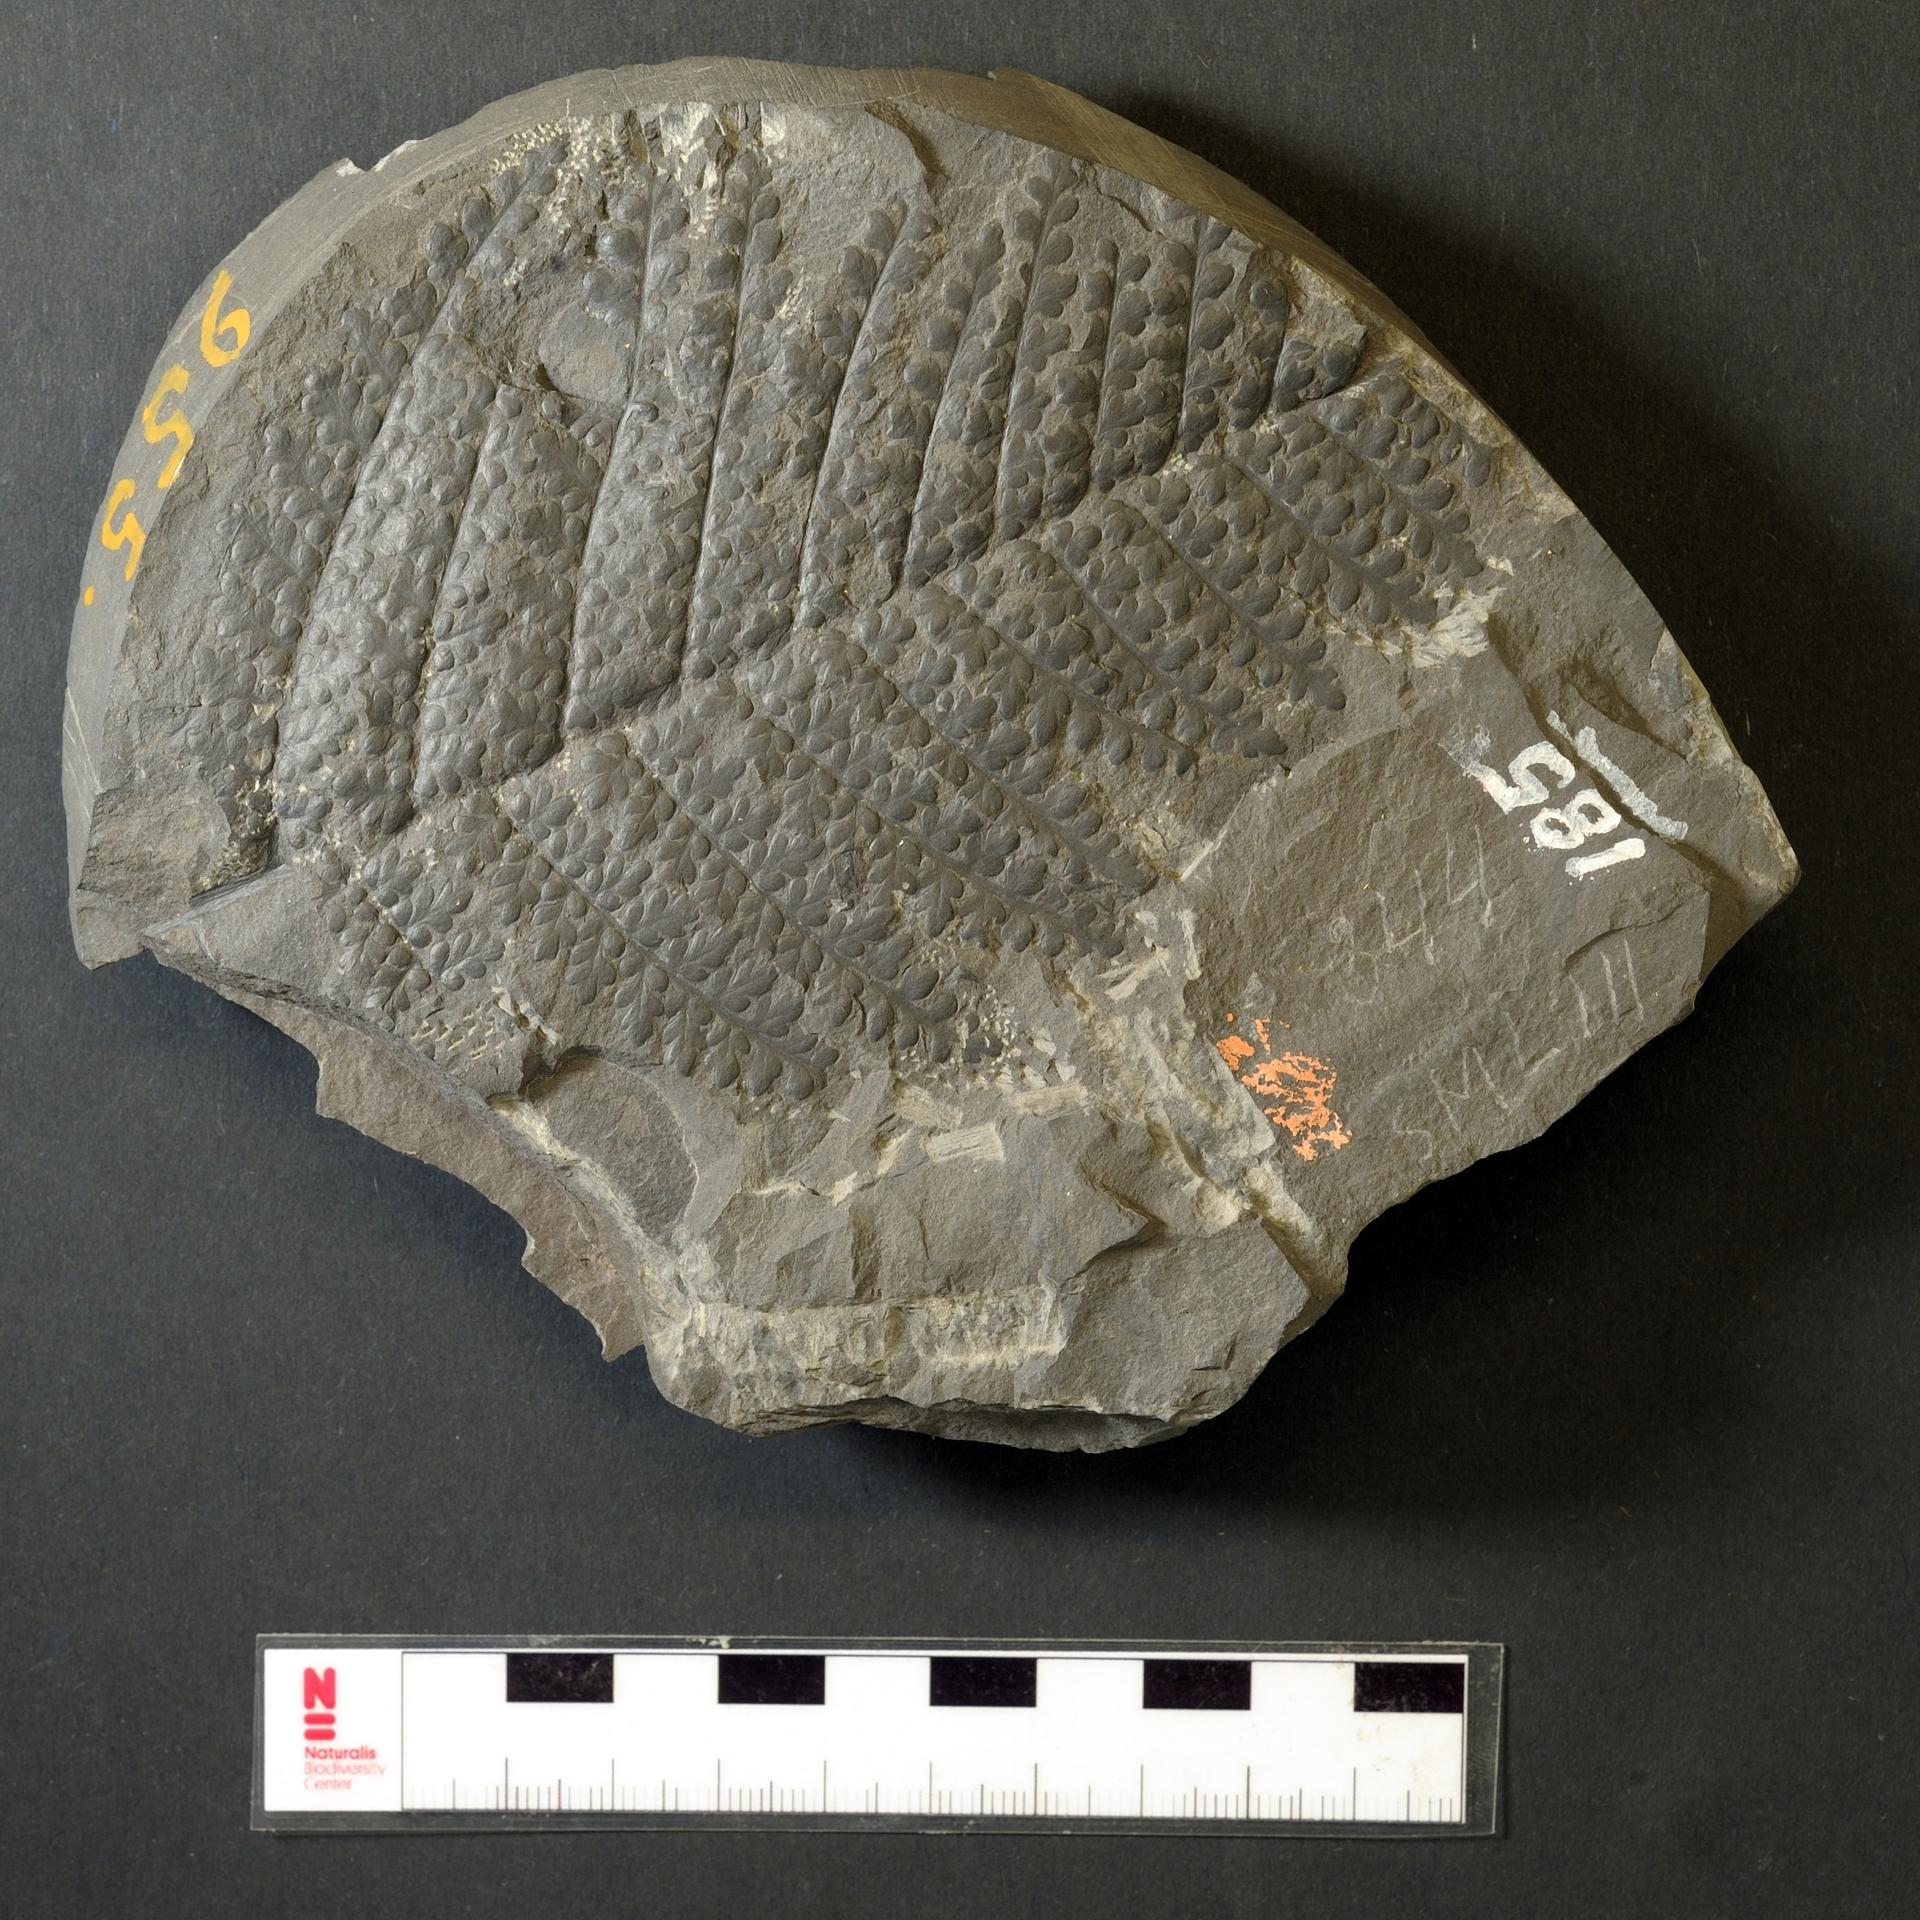 RGM.JMS.955   Eusphenopteris hollandica